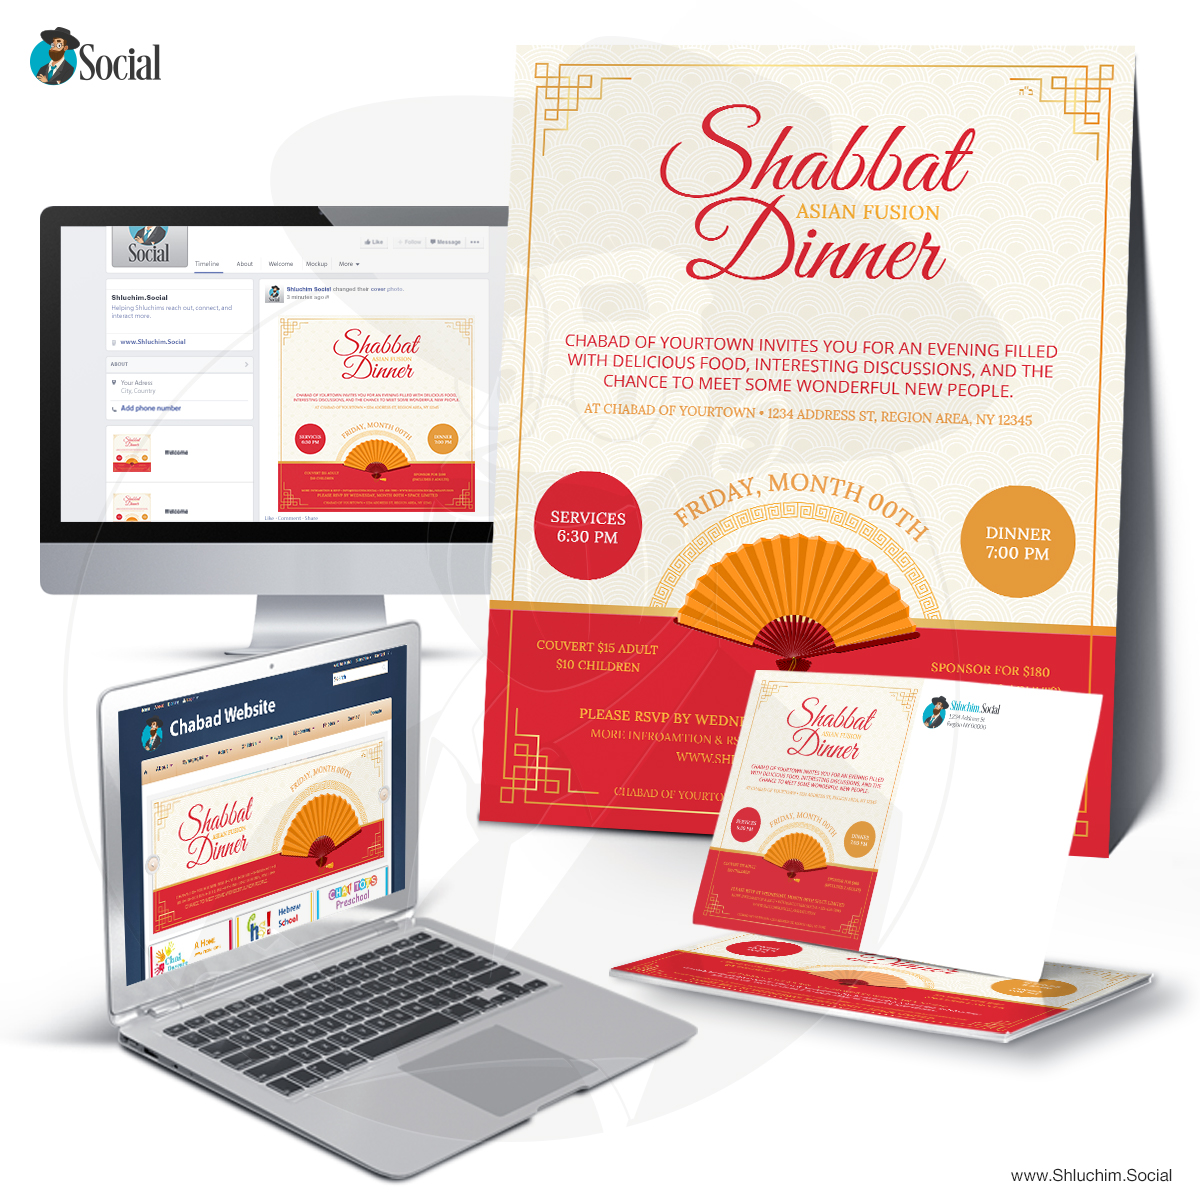 Asian Fusion Shabbat Dinner